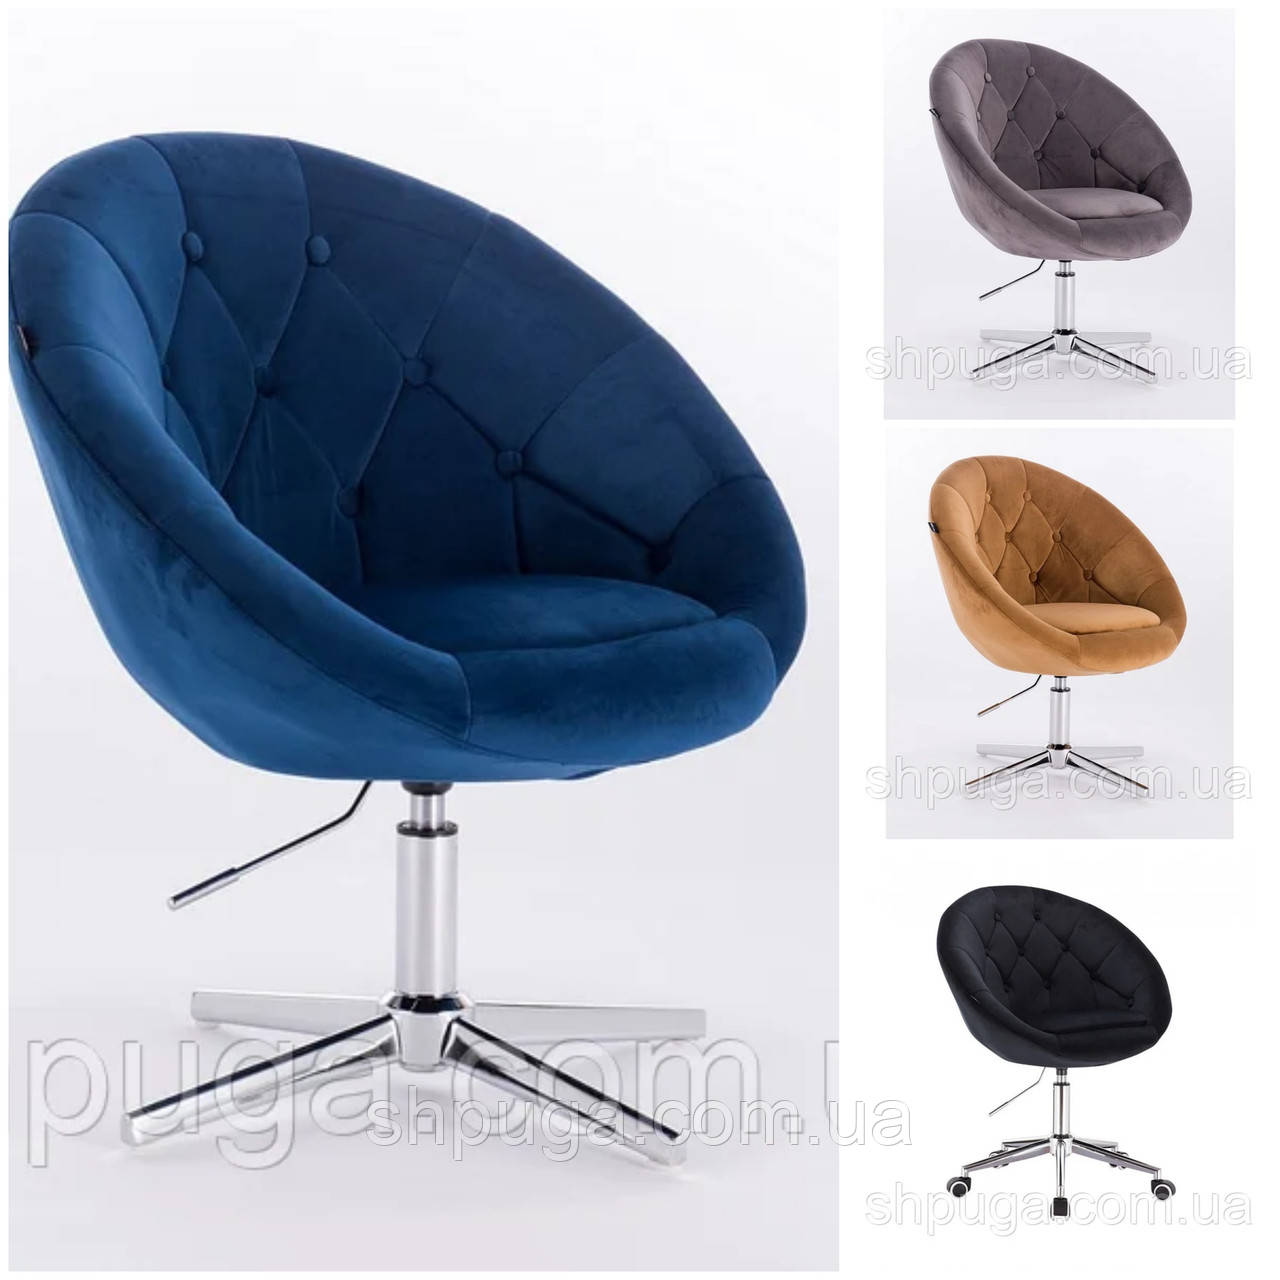 Крісло HC-8516 кремове велюр